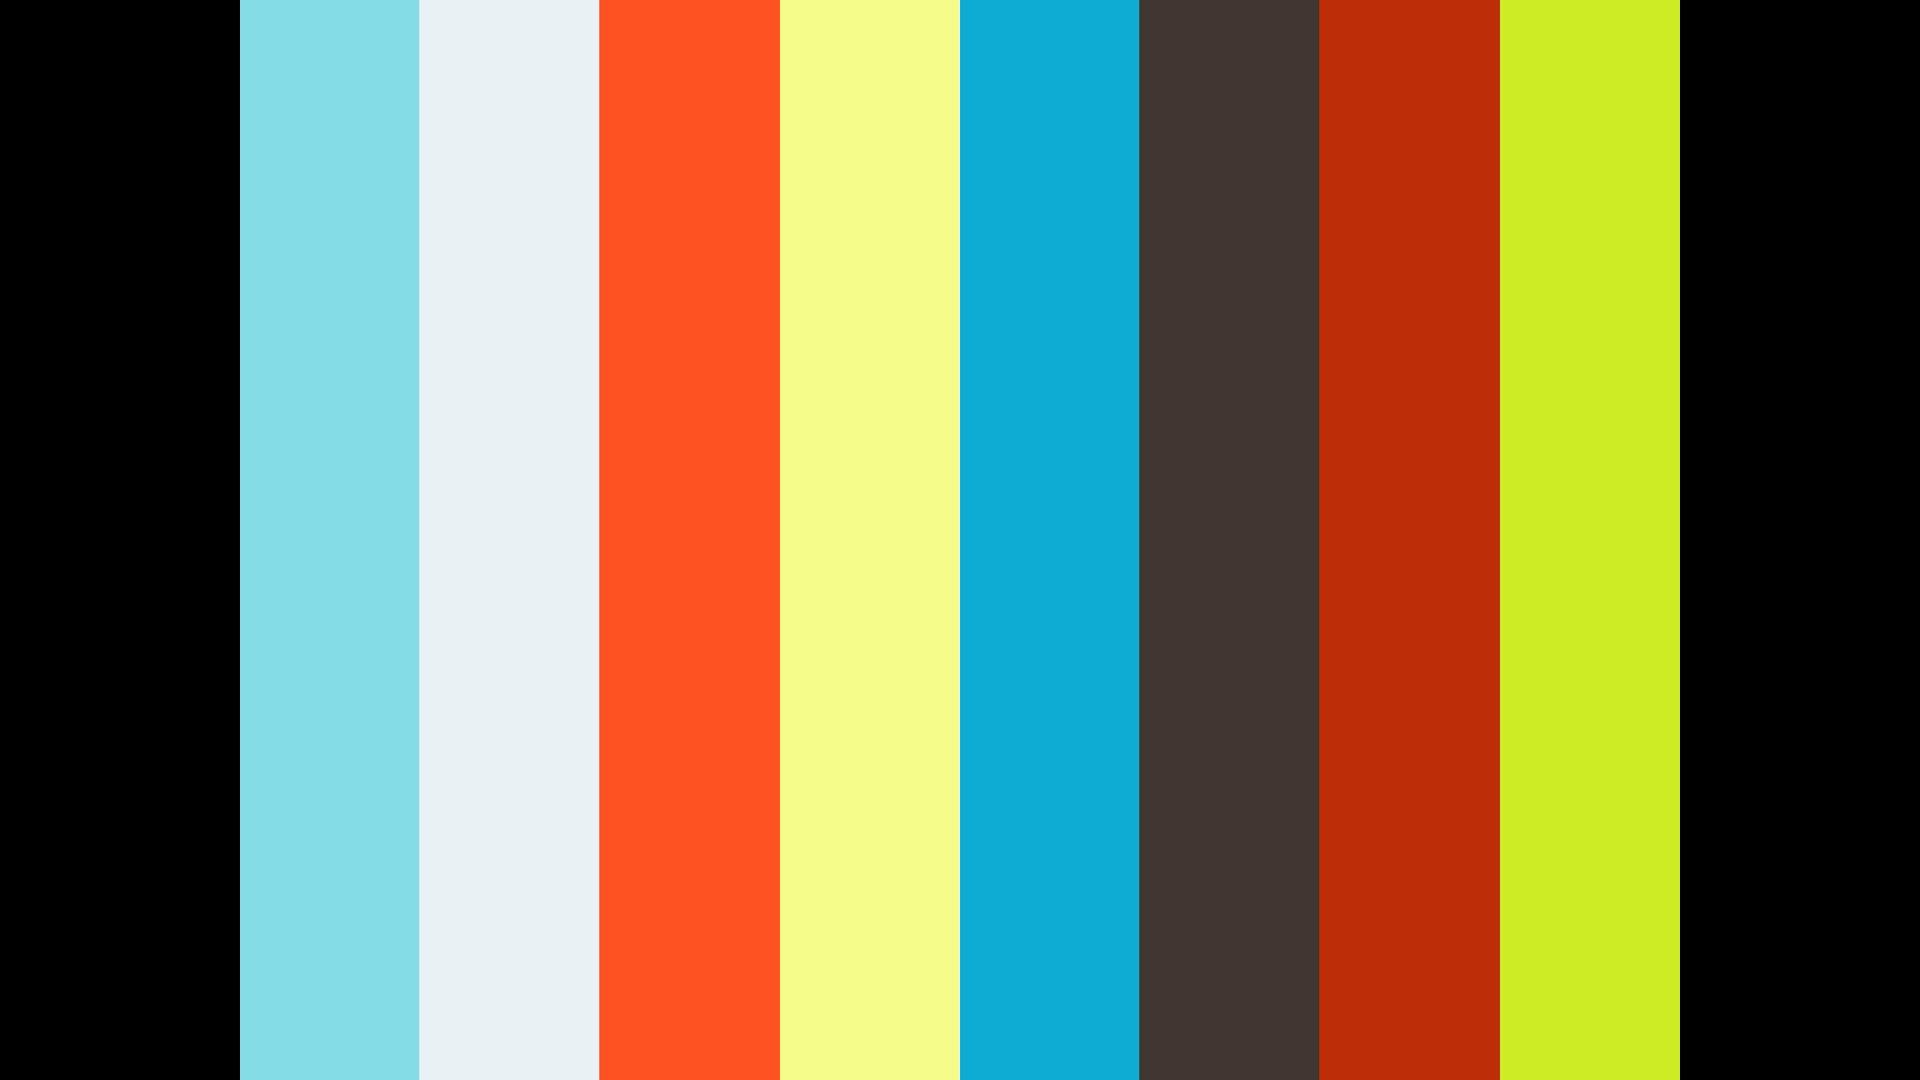 2020-02-16 ILOT TENIA - SKYVIEW-4